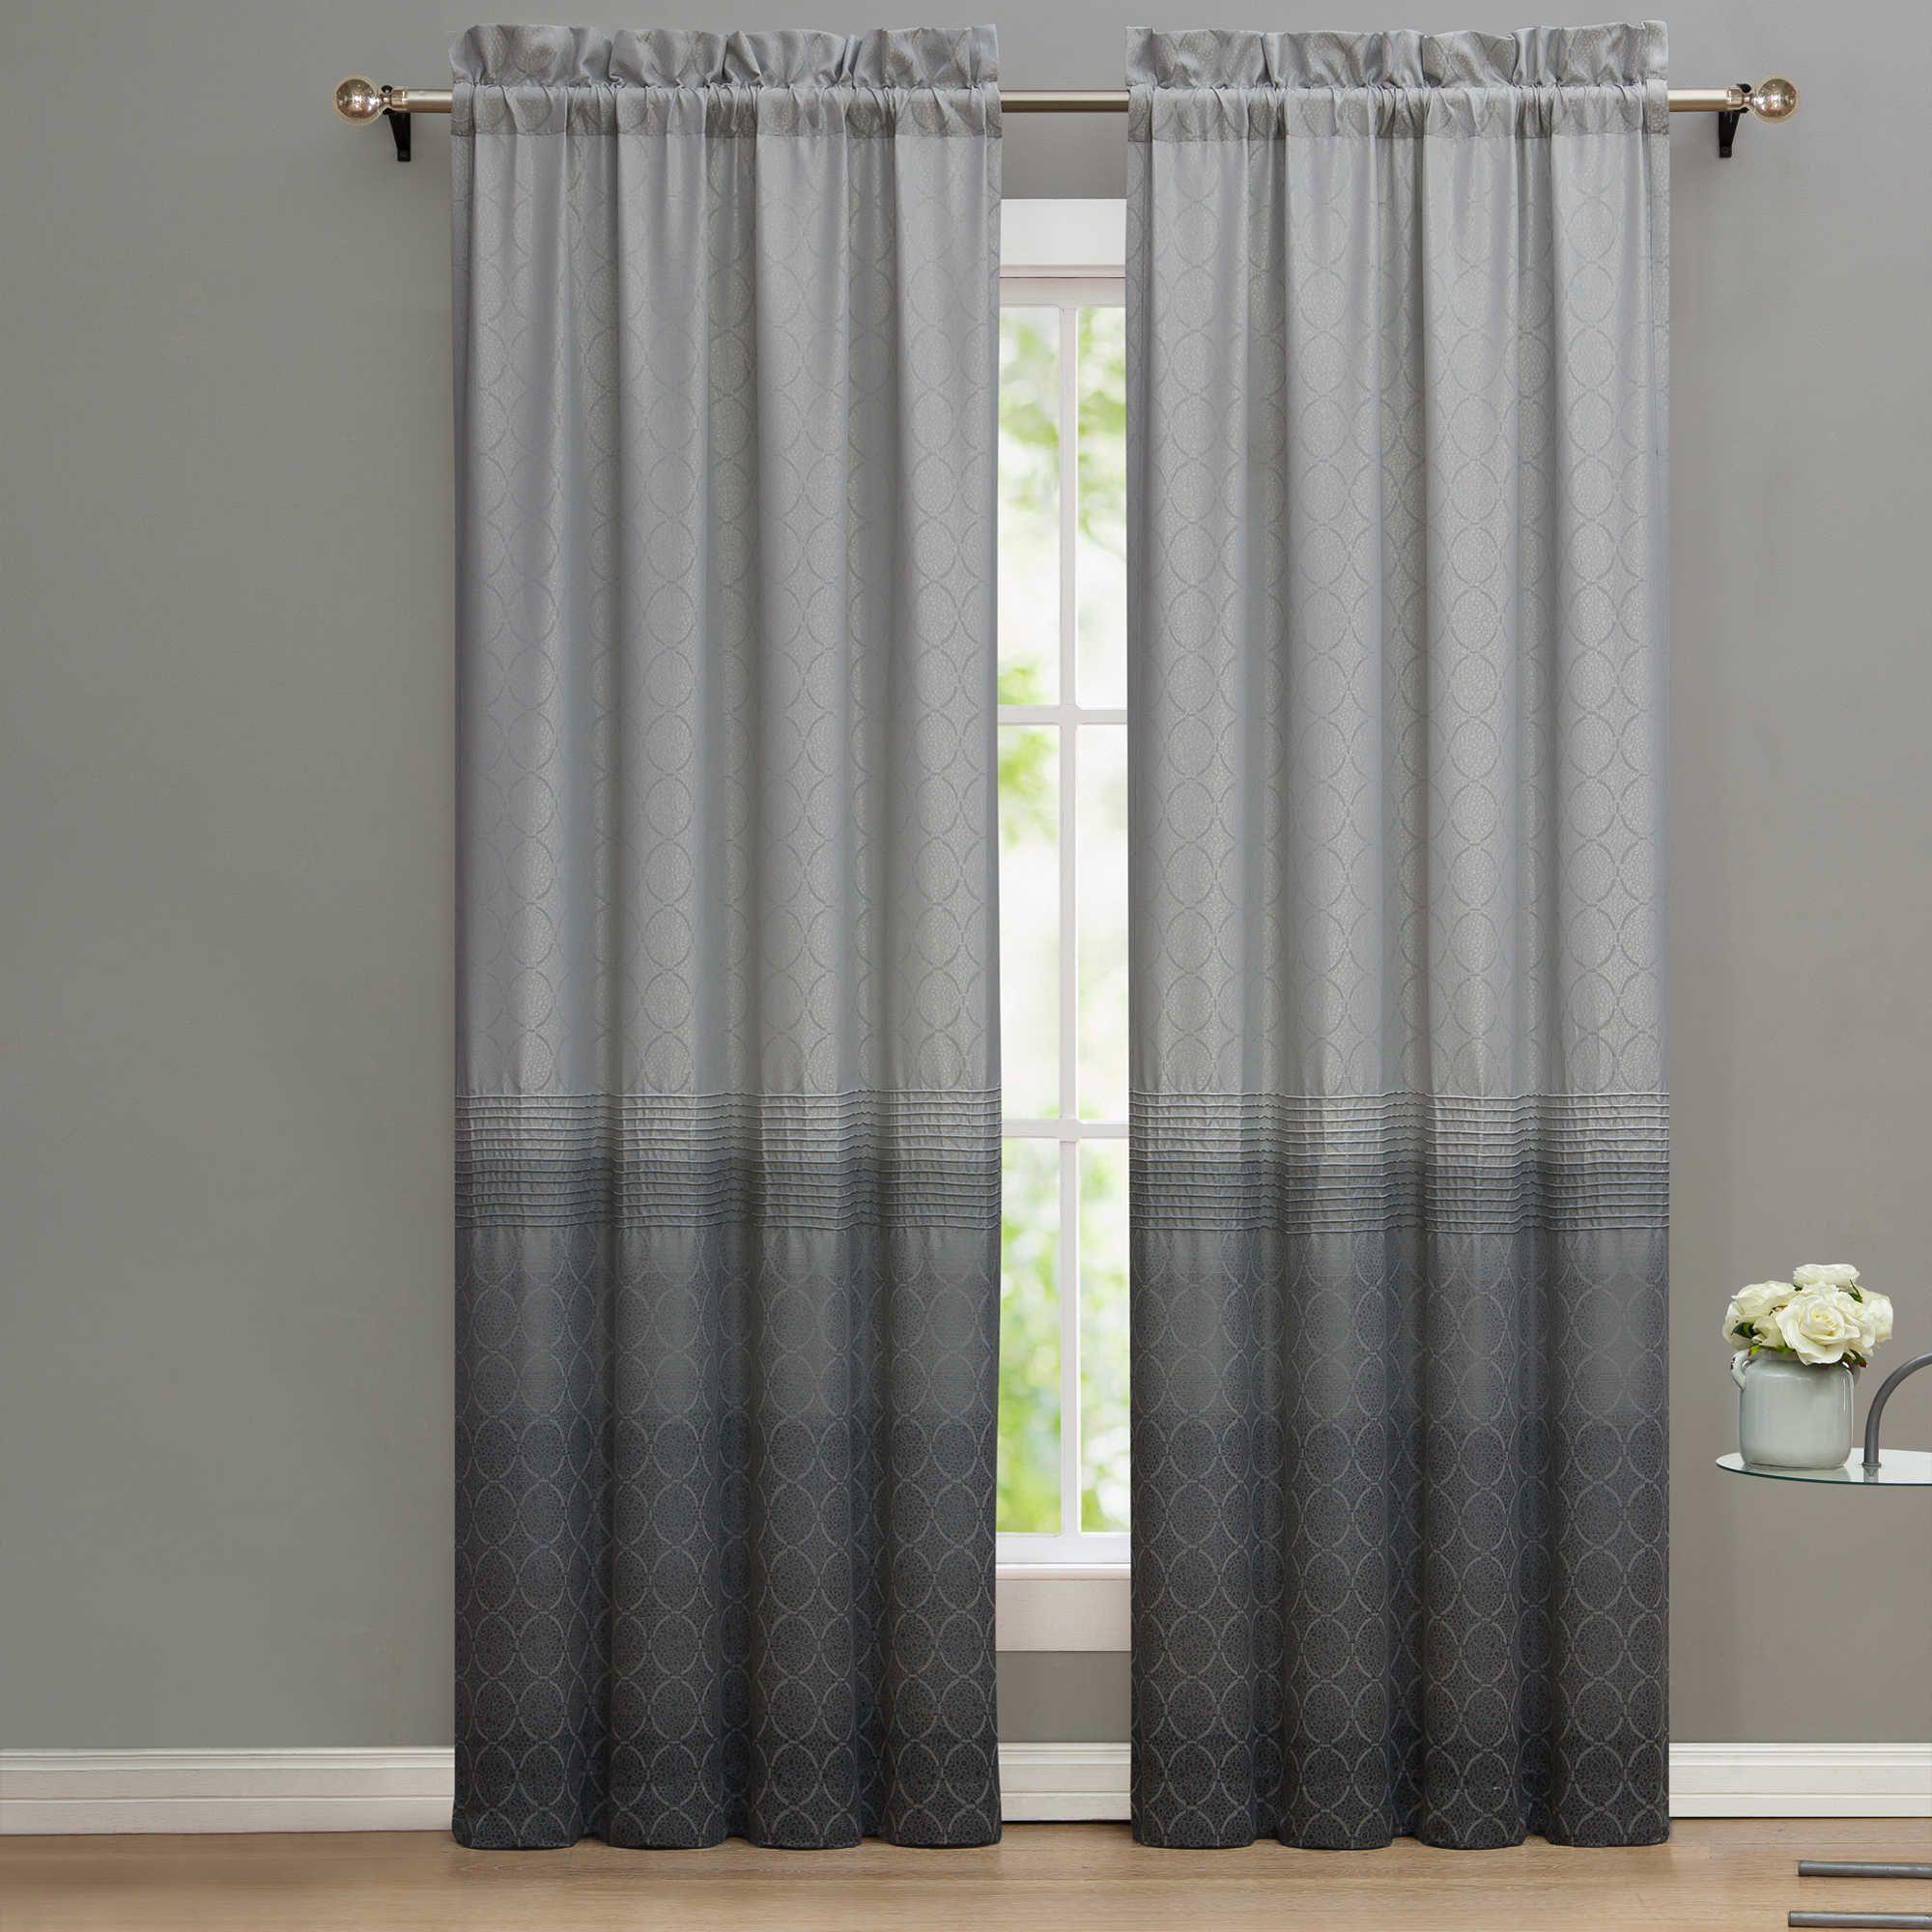 Nikki Chu Lyon Ombre 84 Inch Window Curtain Panel Pair In Silver